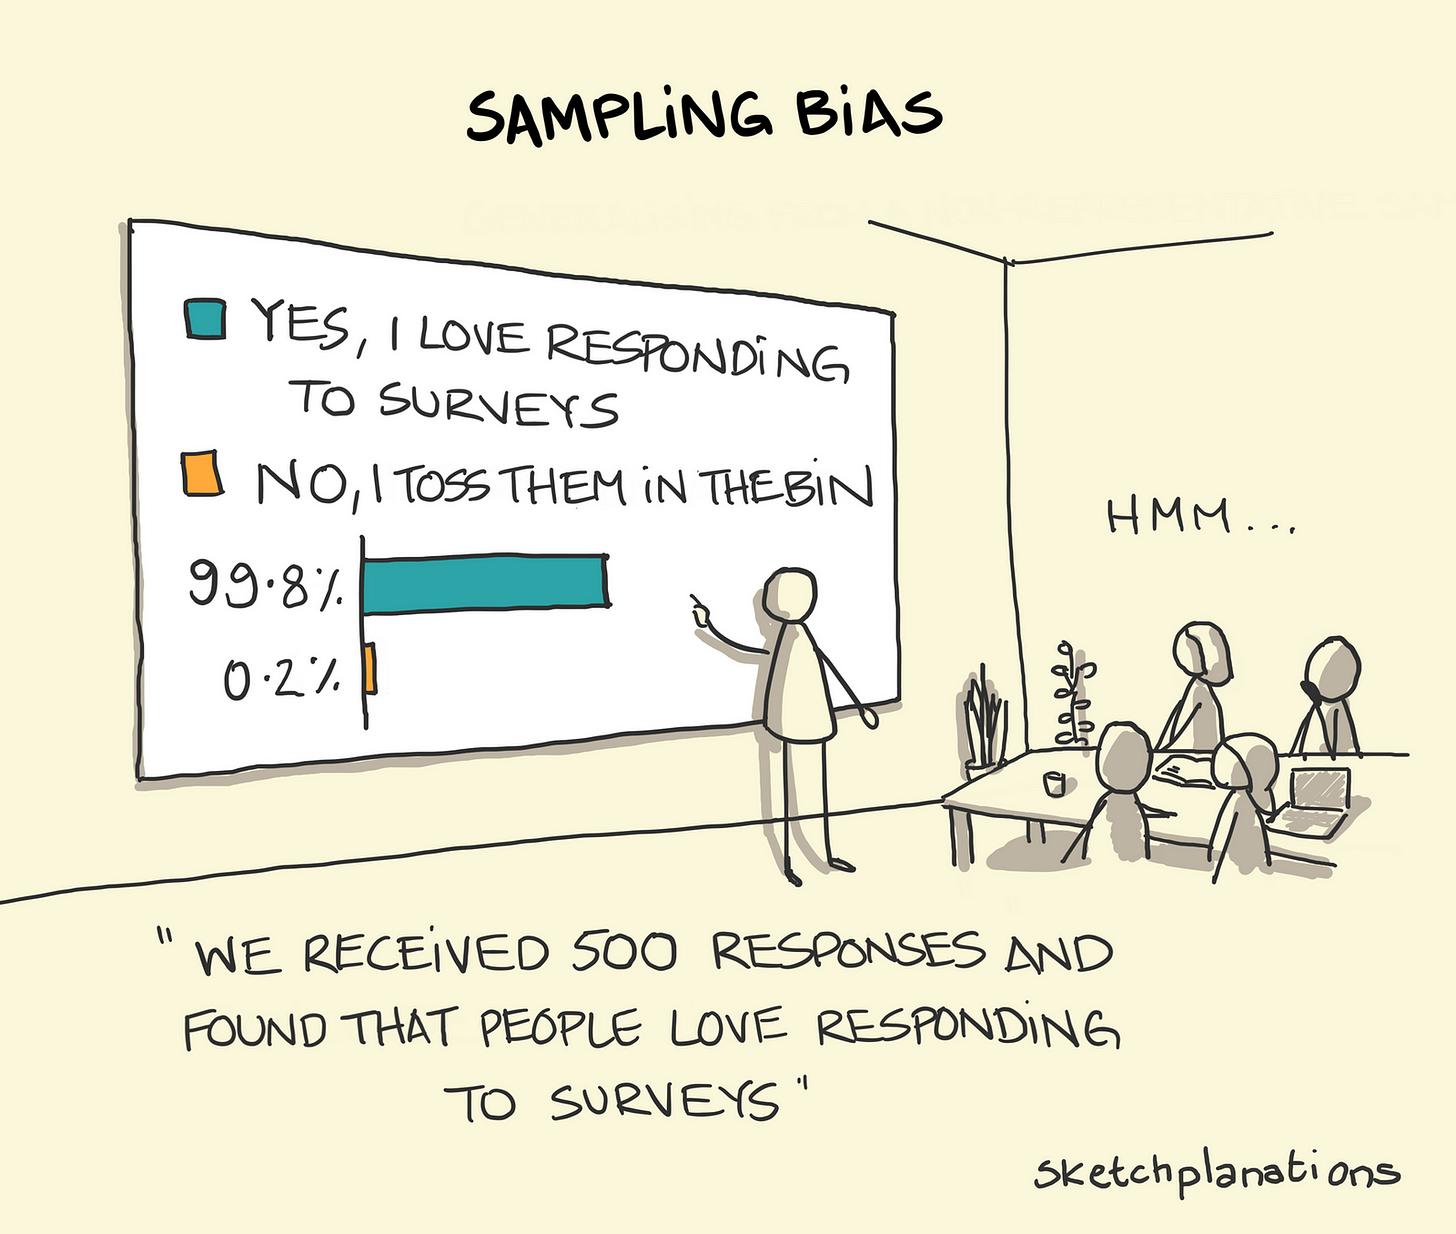 Sampling bias - Sketchplanations